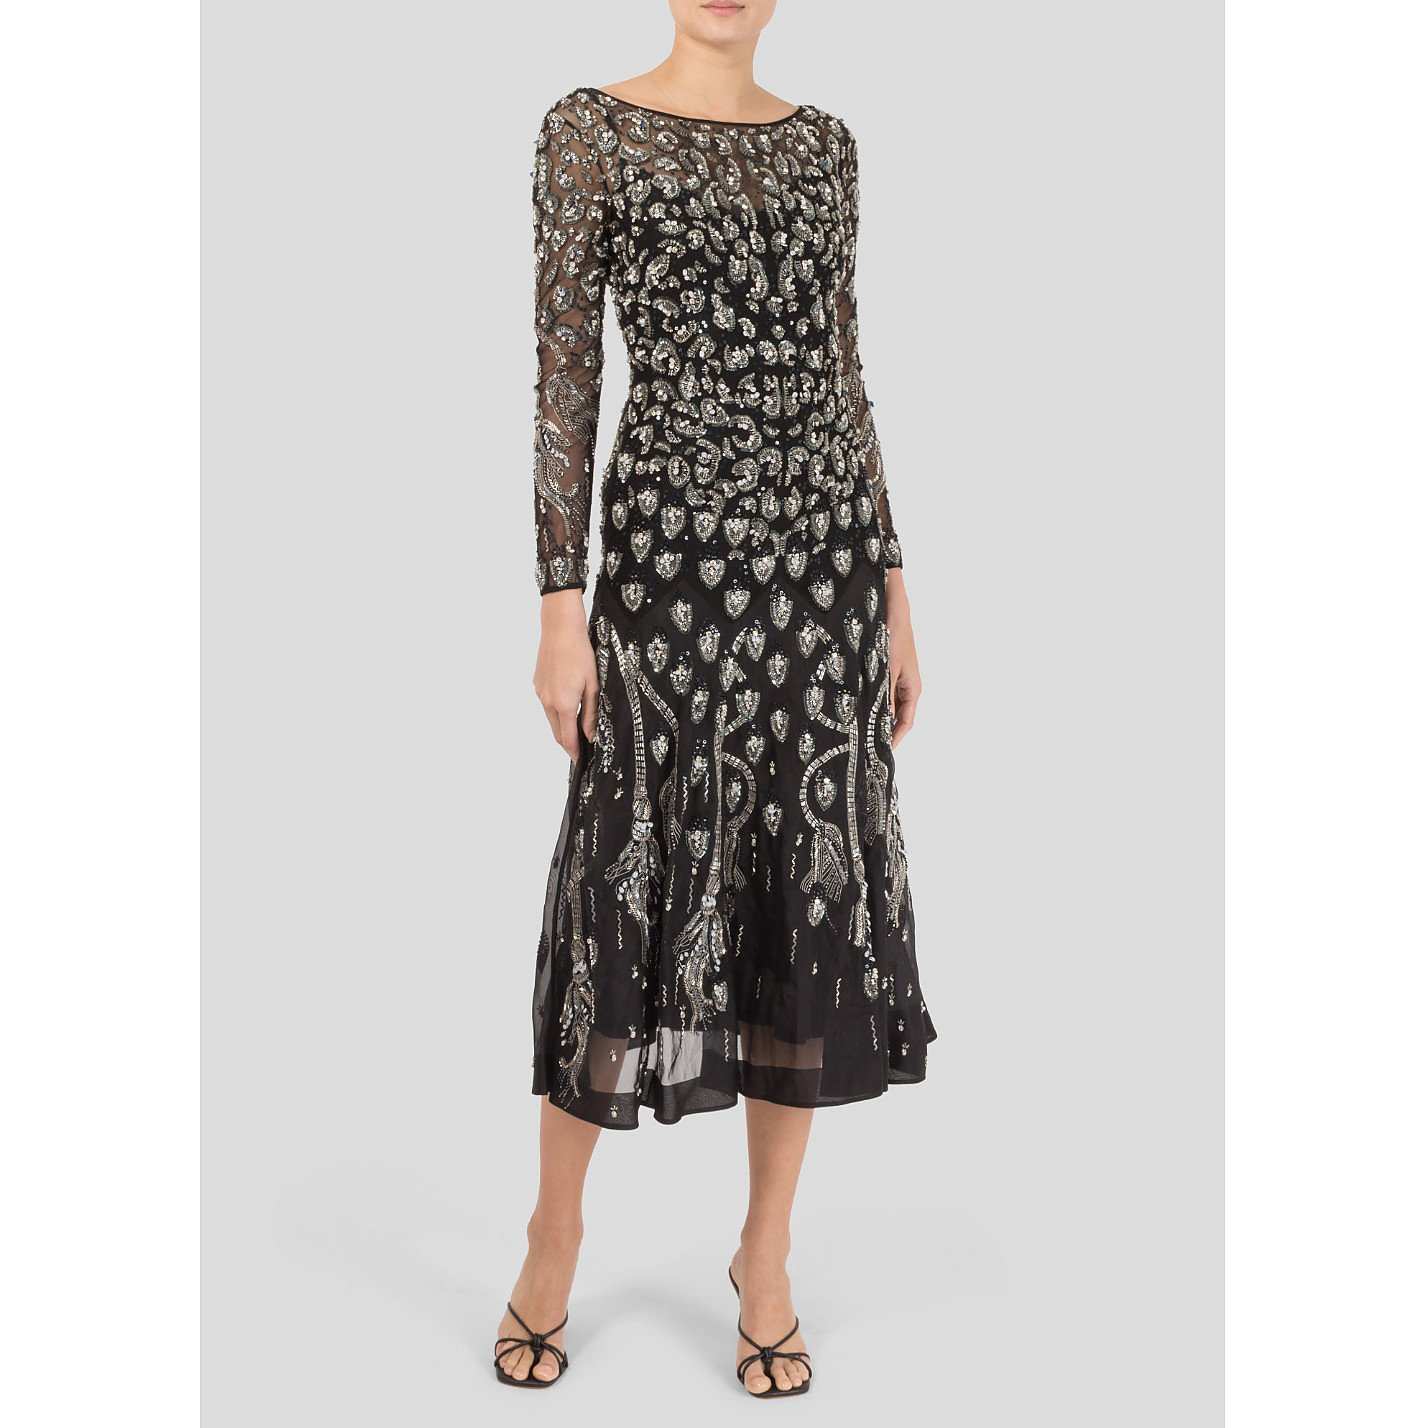 Temperley London Night Midi Dress